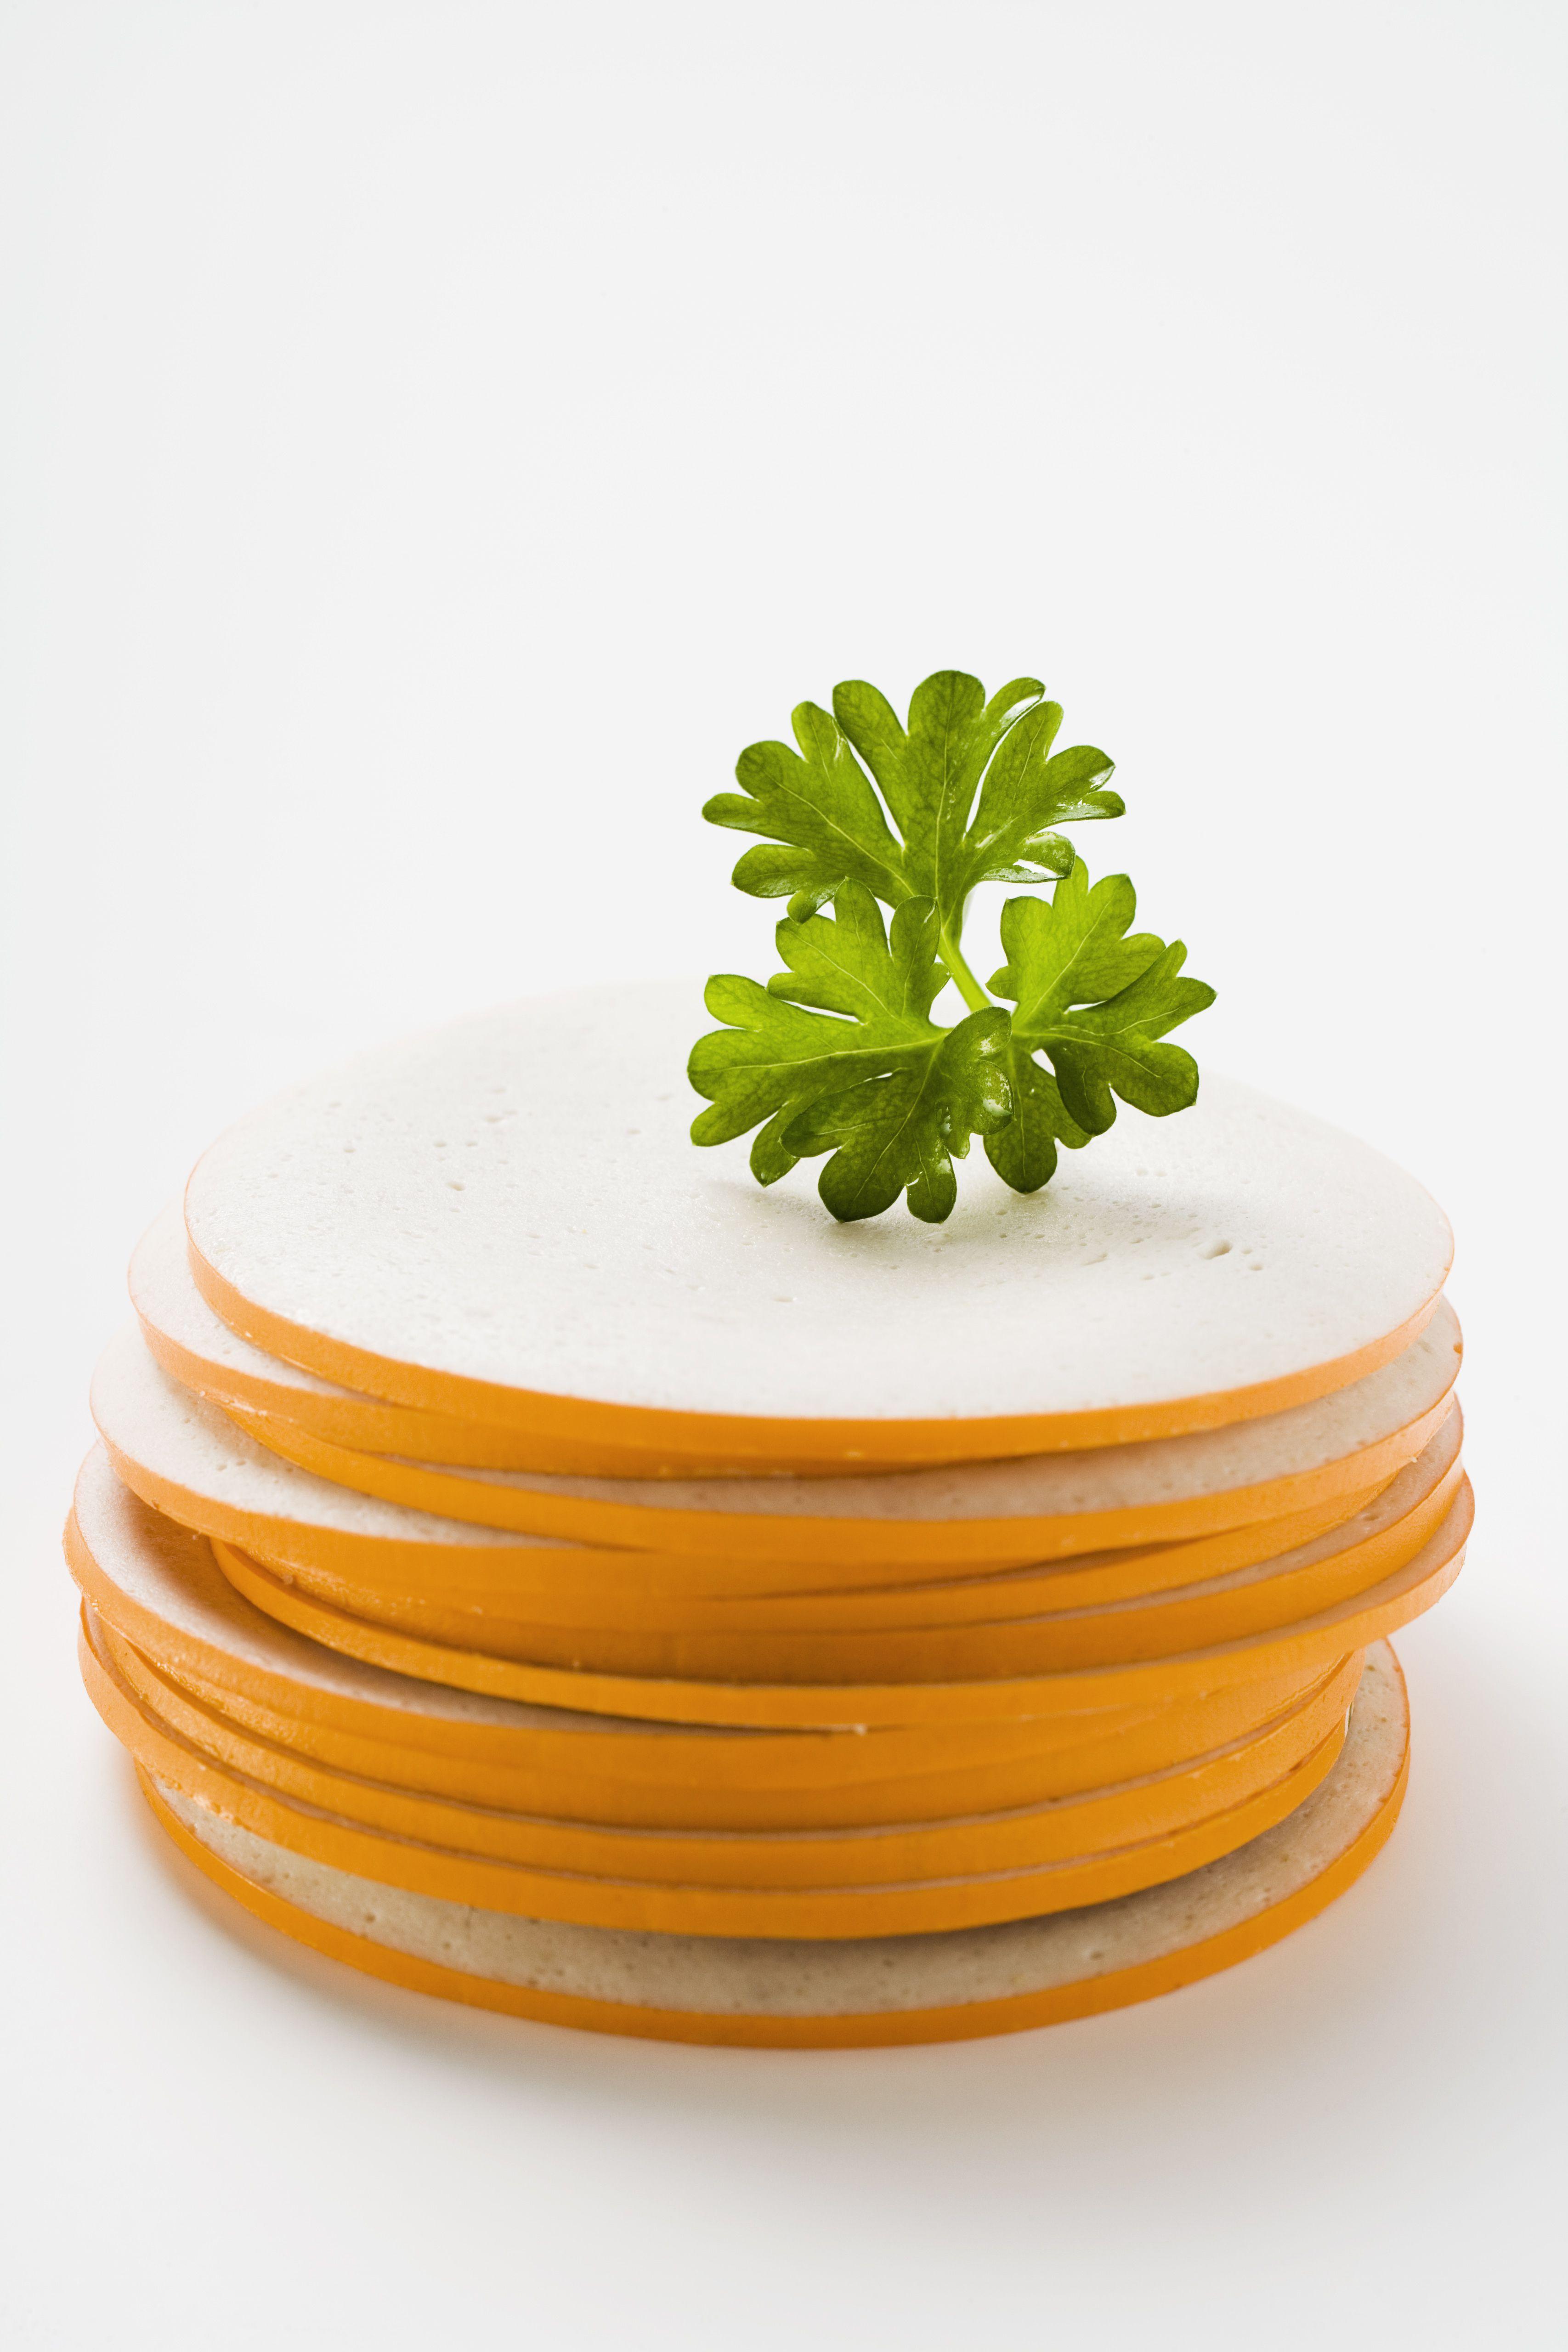 German Gelbwurst slices with parsley sprig